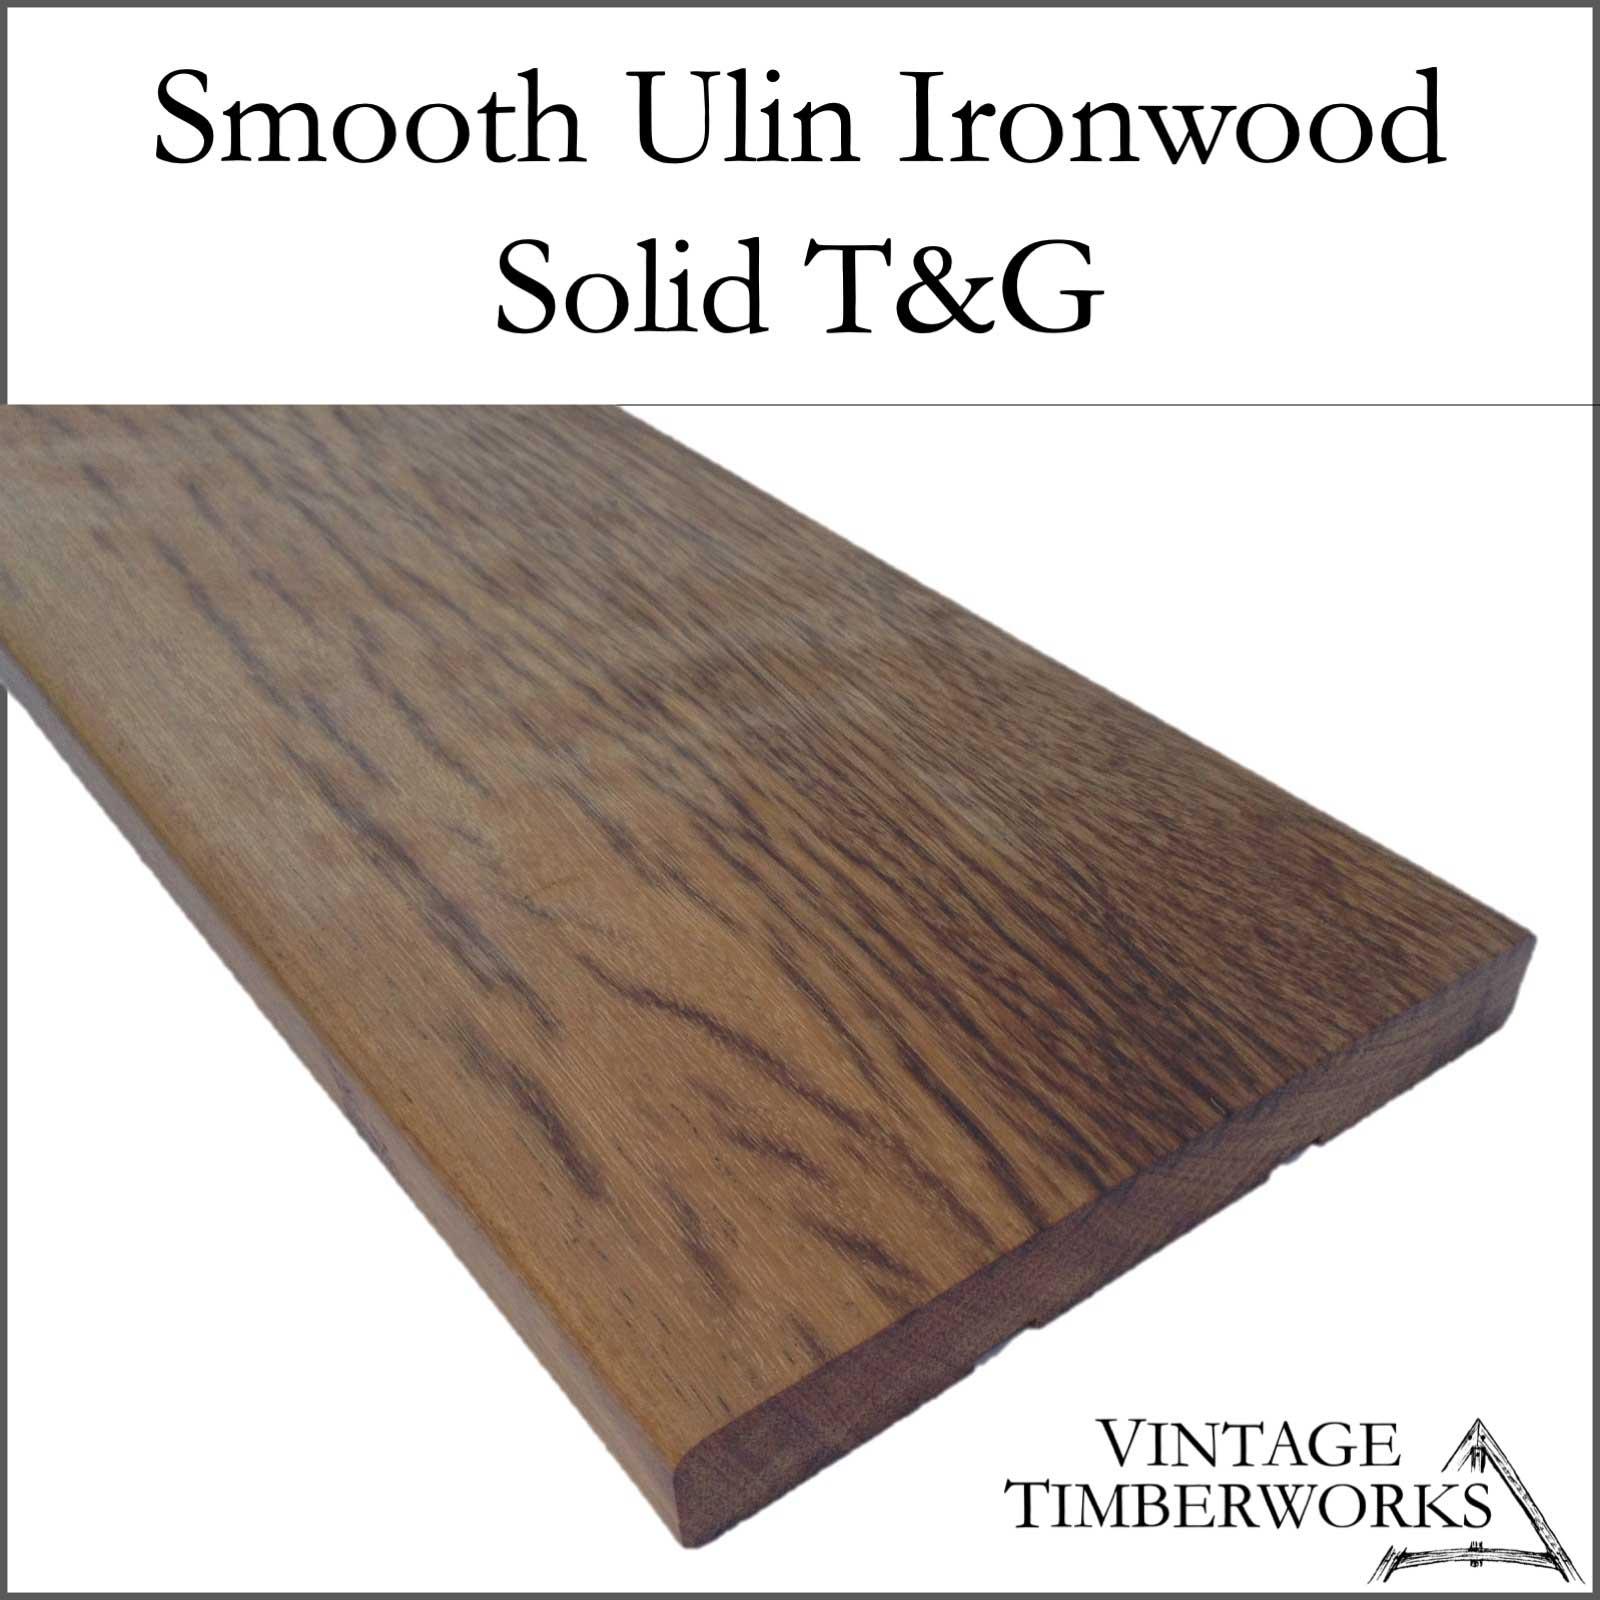 Smooth Ulin Ironwood Solid Decking - Ulin Ironwood